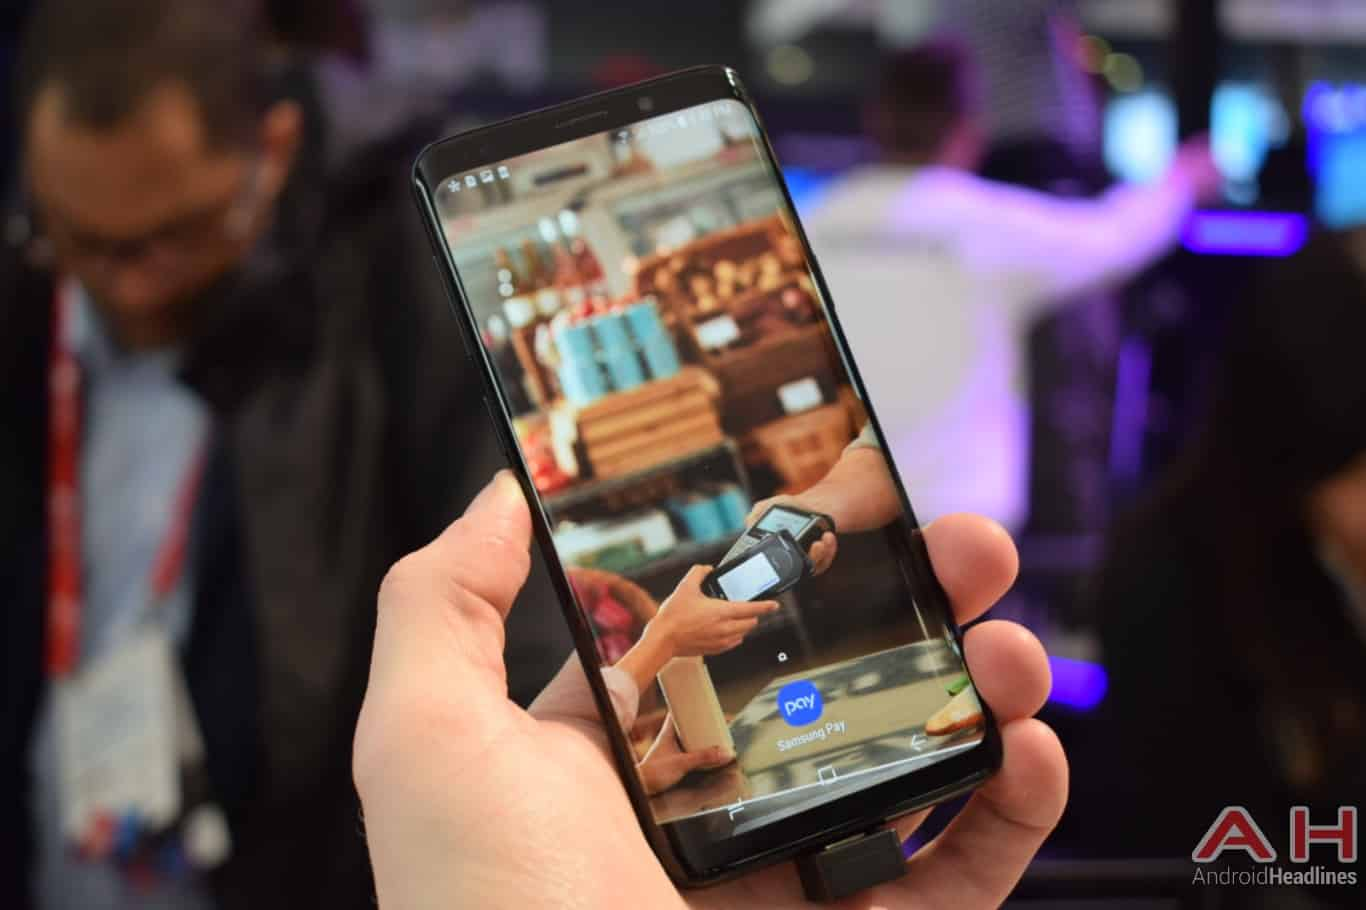 AH Samsung Galaxy S9 MWC image 116